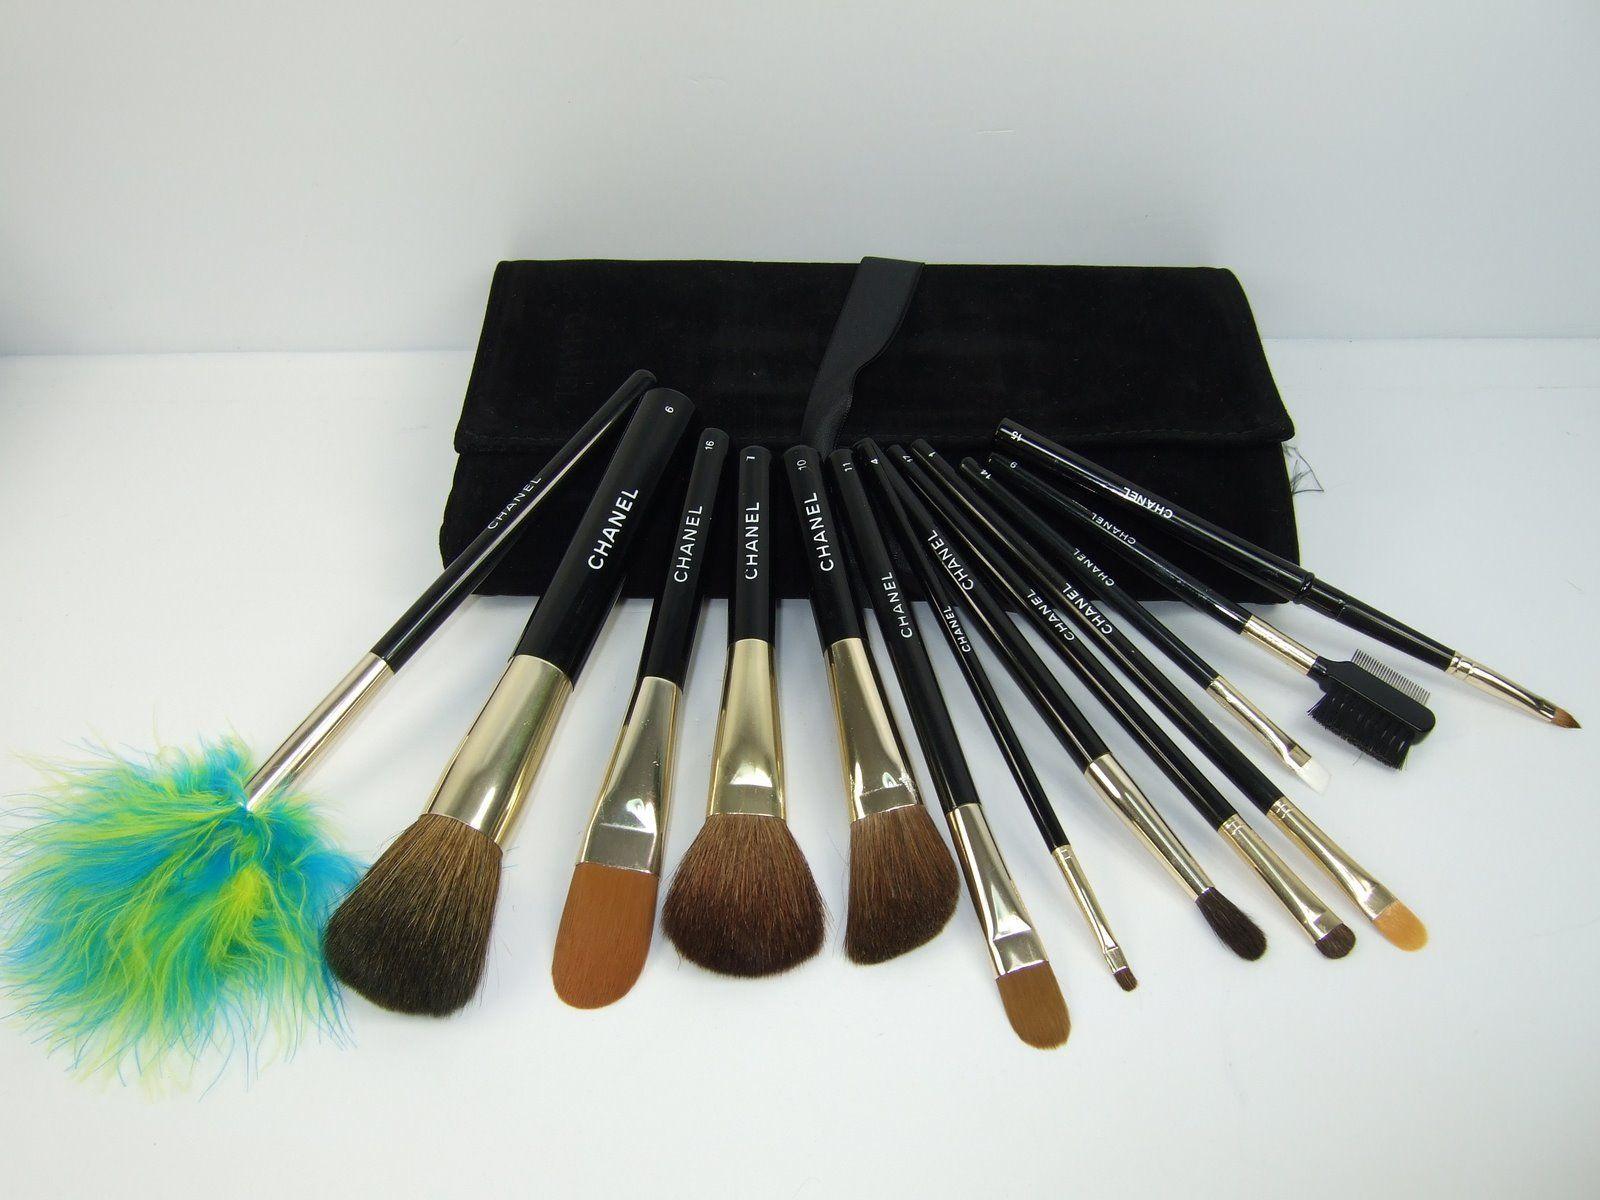 Chanel Make up brushes.